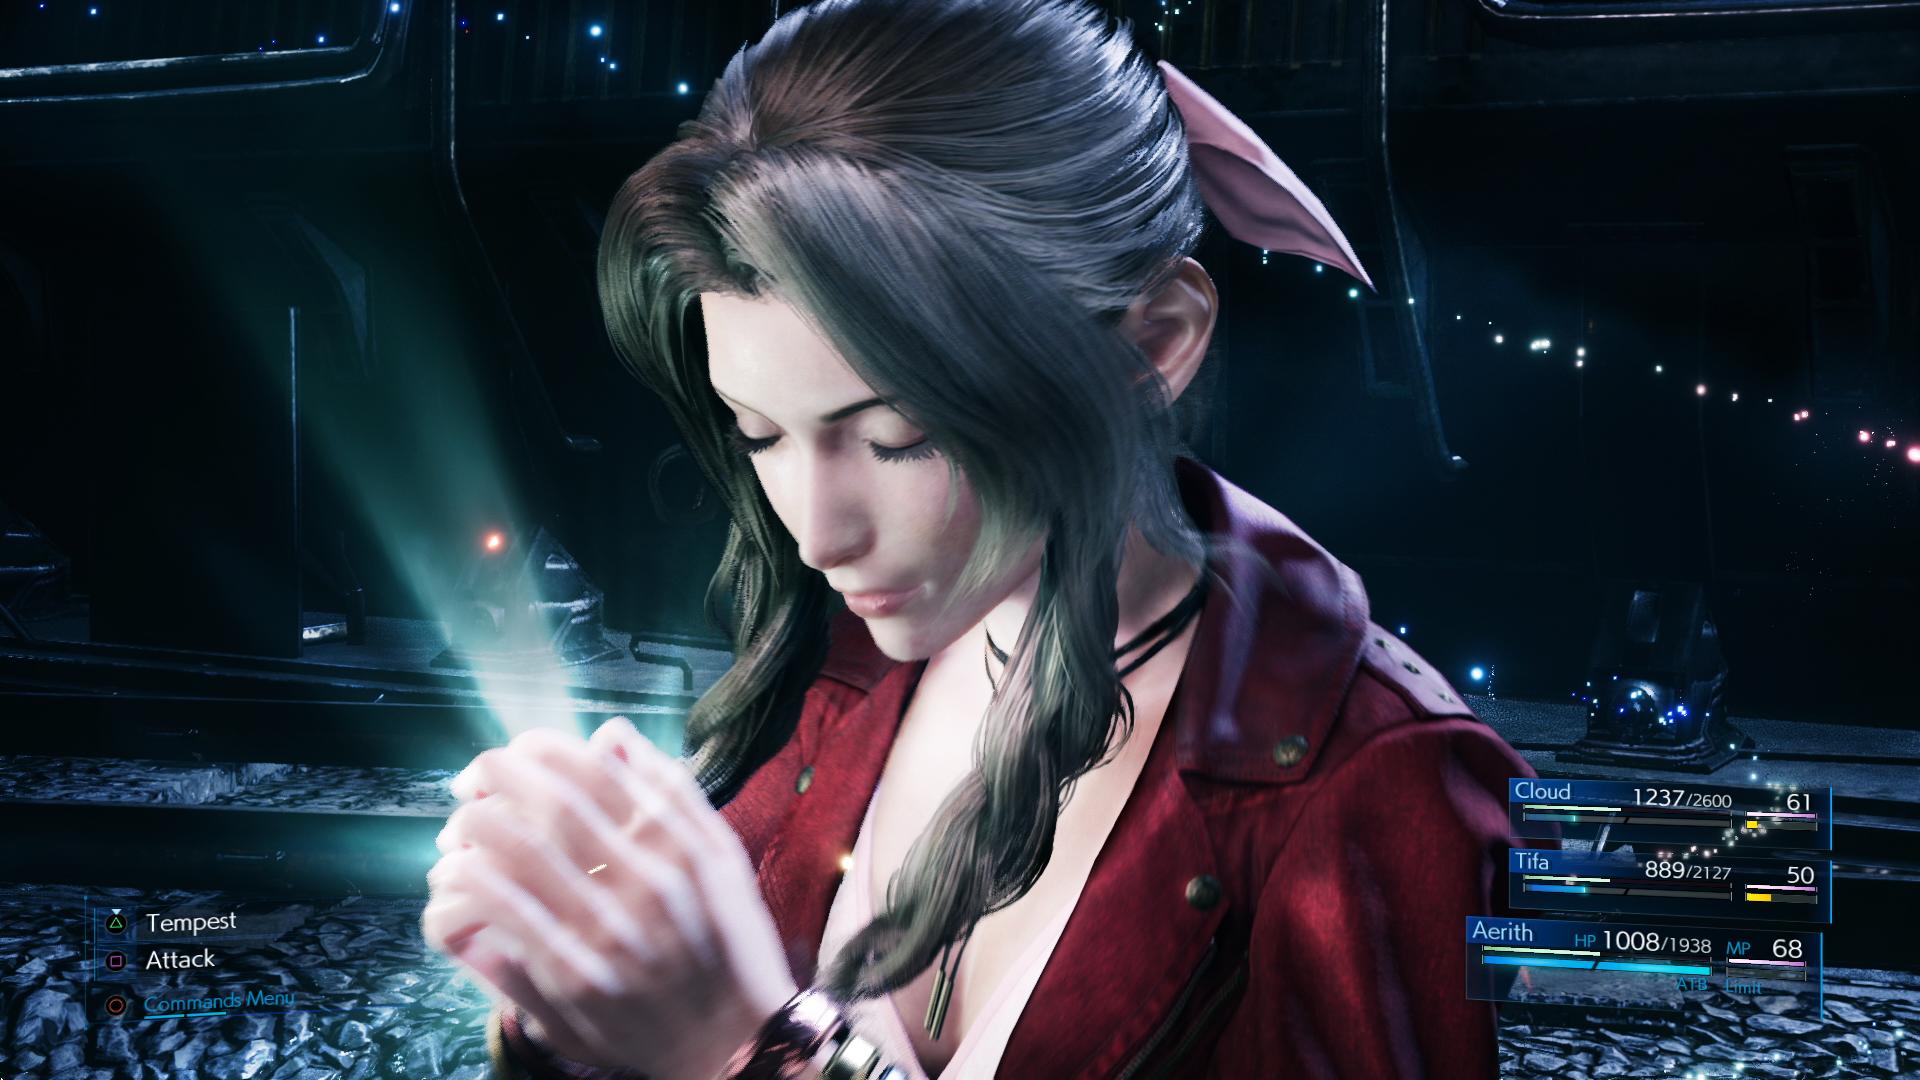 Tifa Lockhart Is Coming To Dissidia Final Fantasy NT